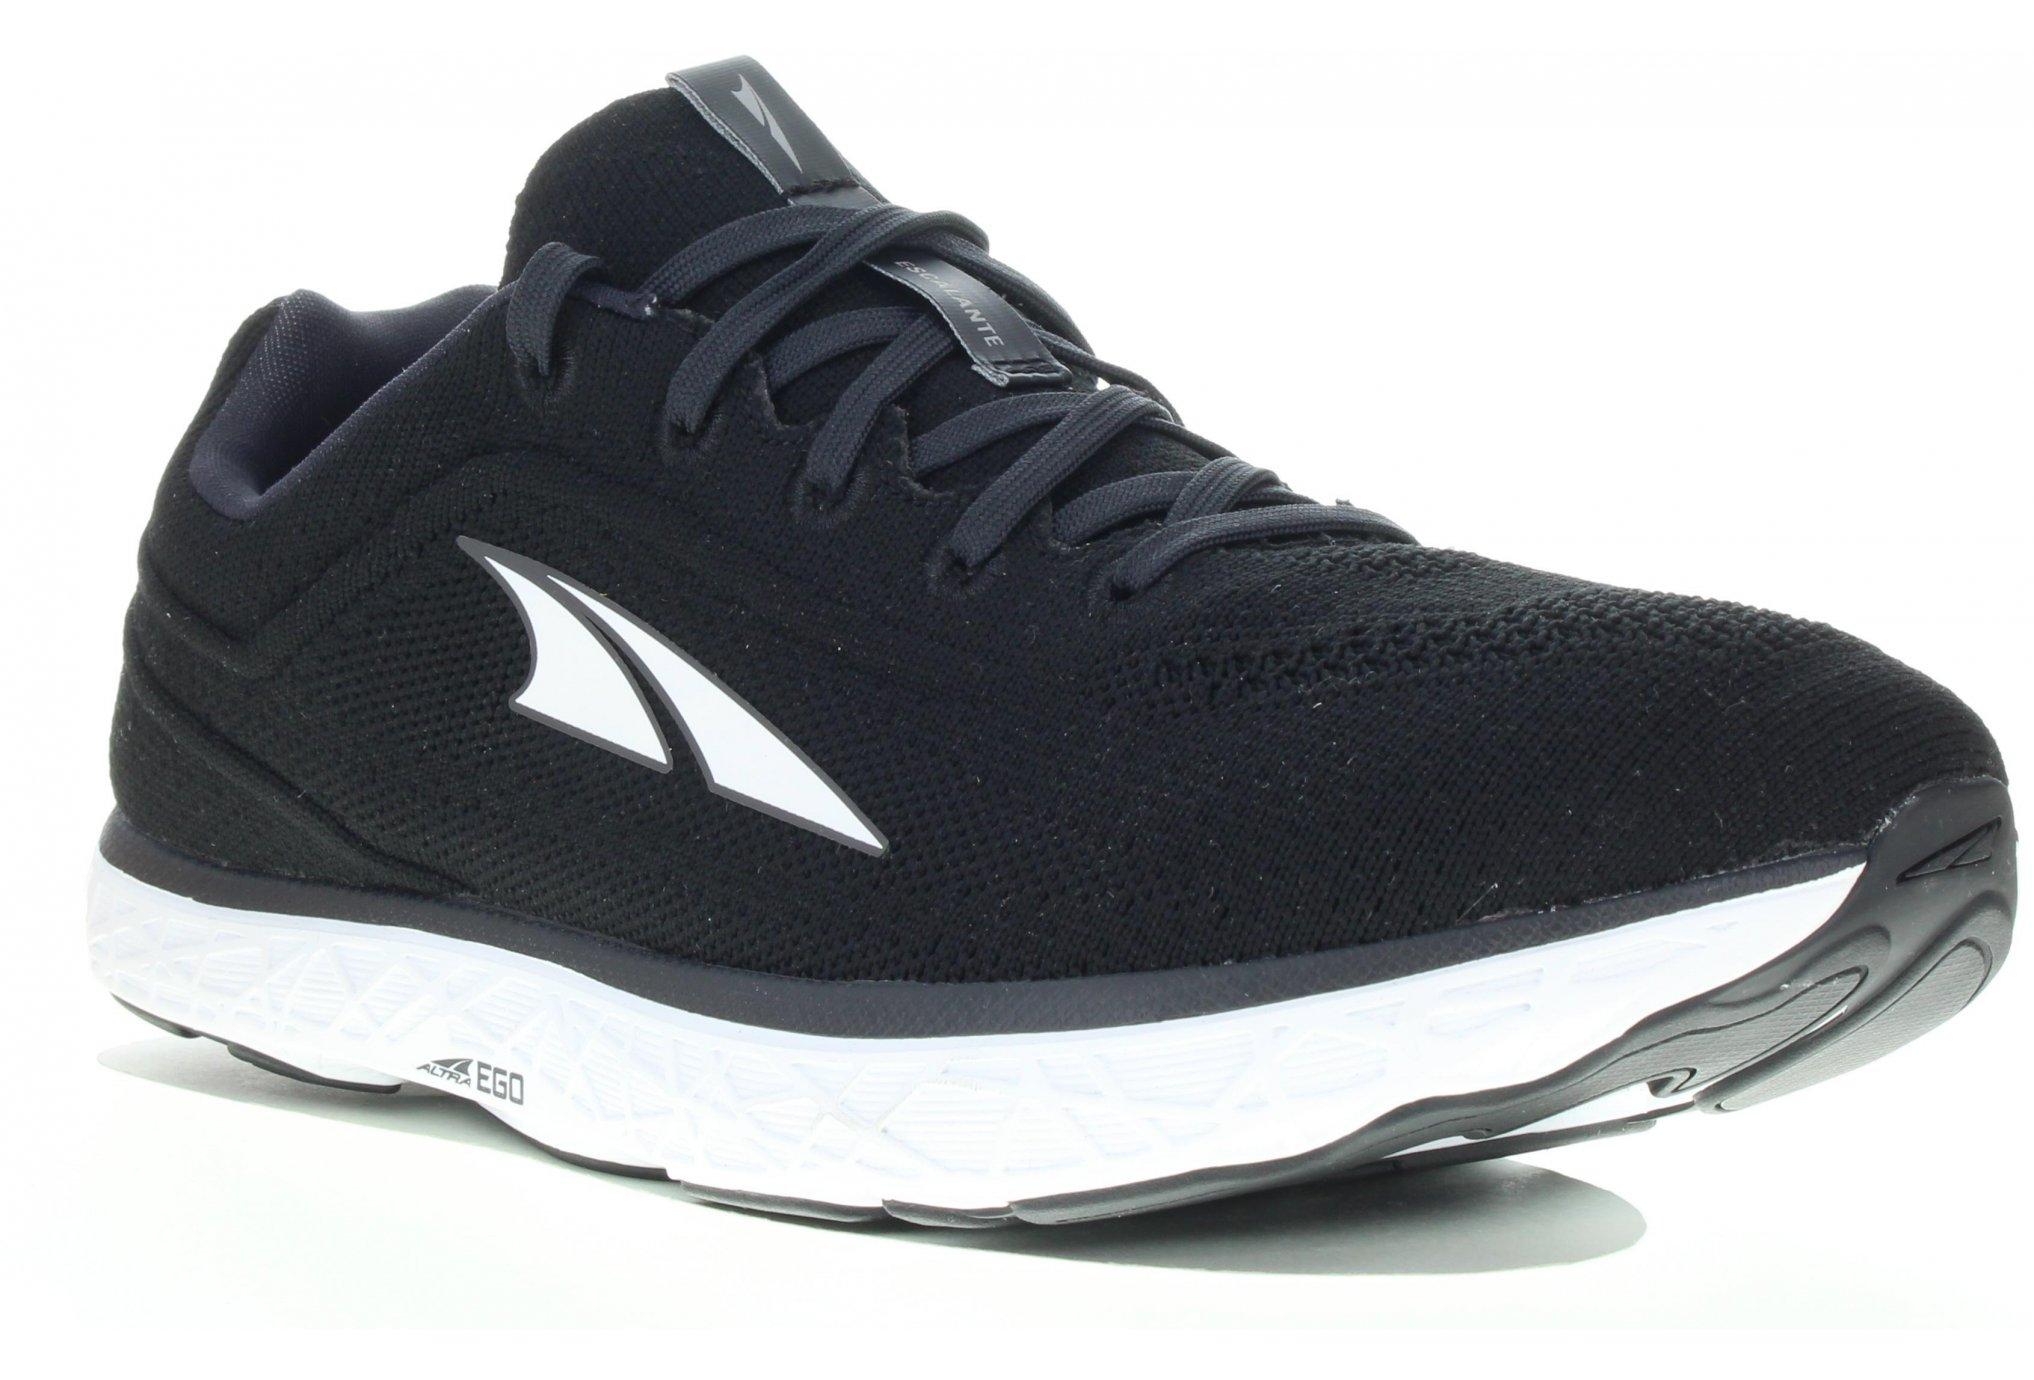 Altra Escalante 2.5 Chaussures homme